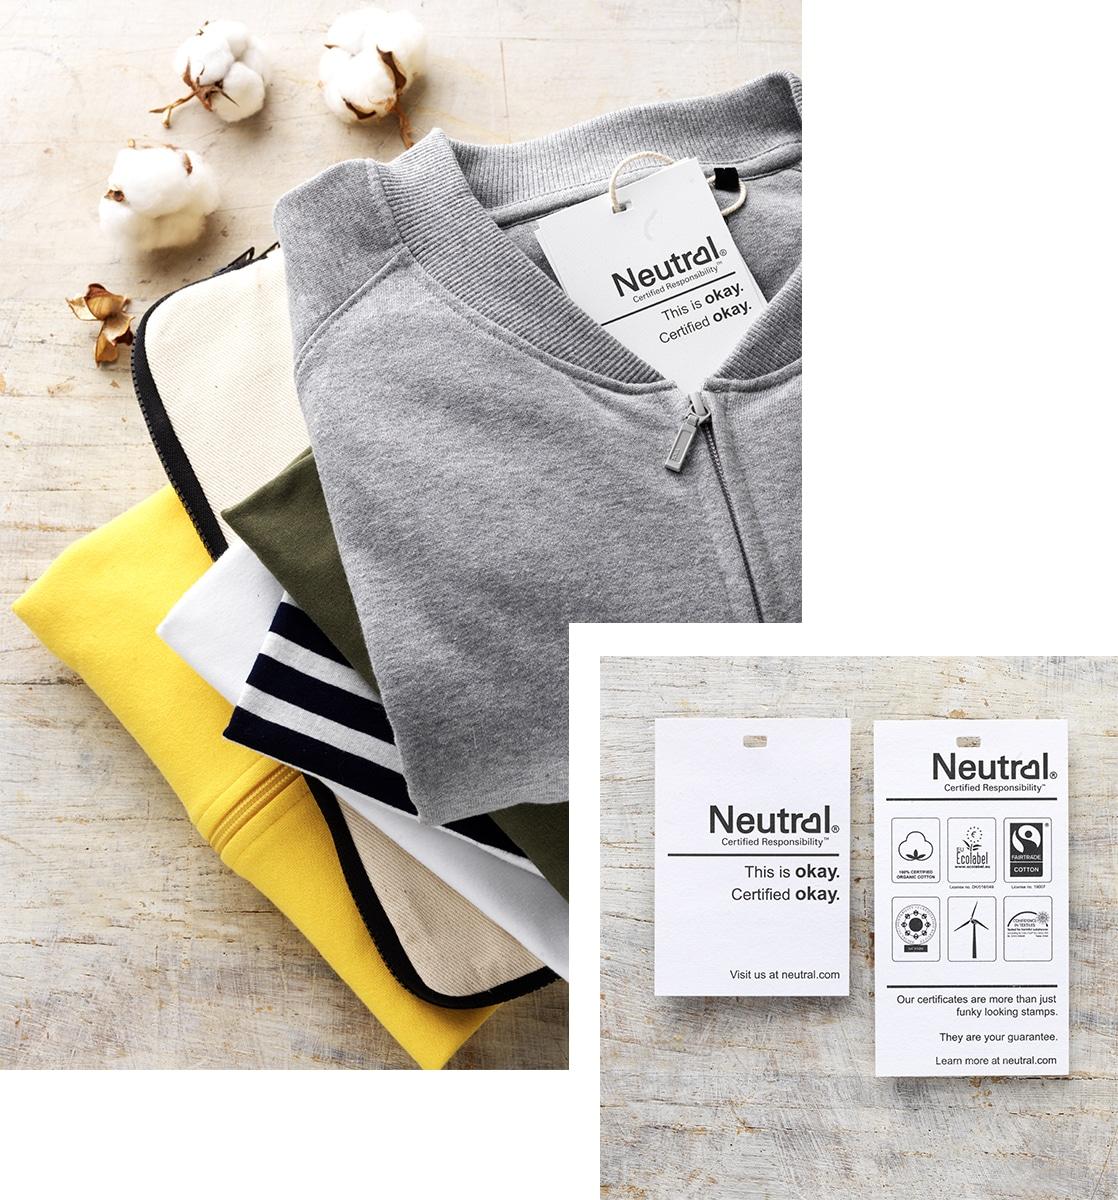 Duurzame neutral certified bedrijfskleding